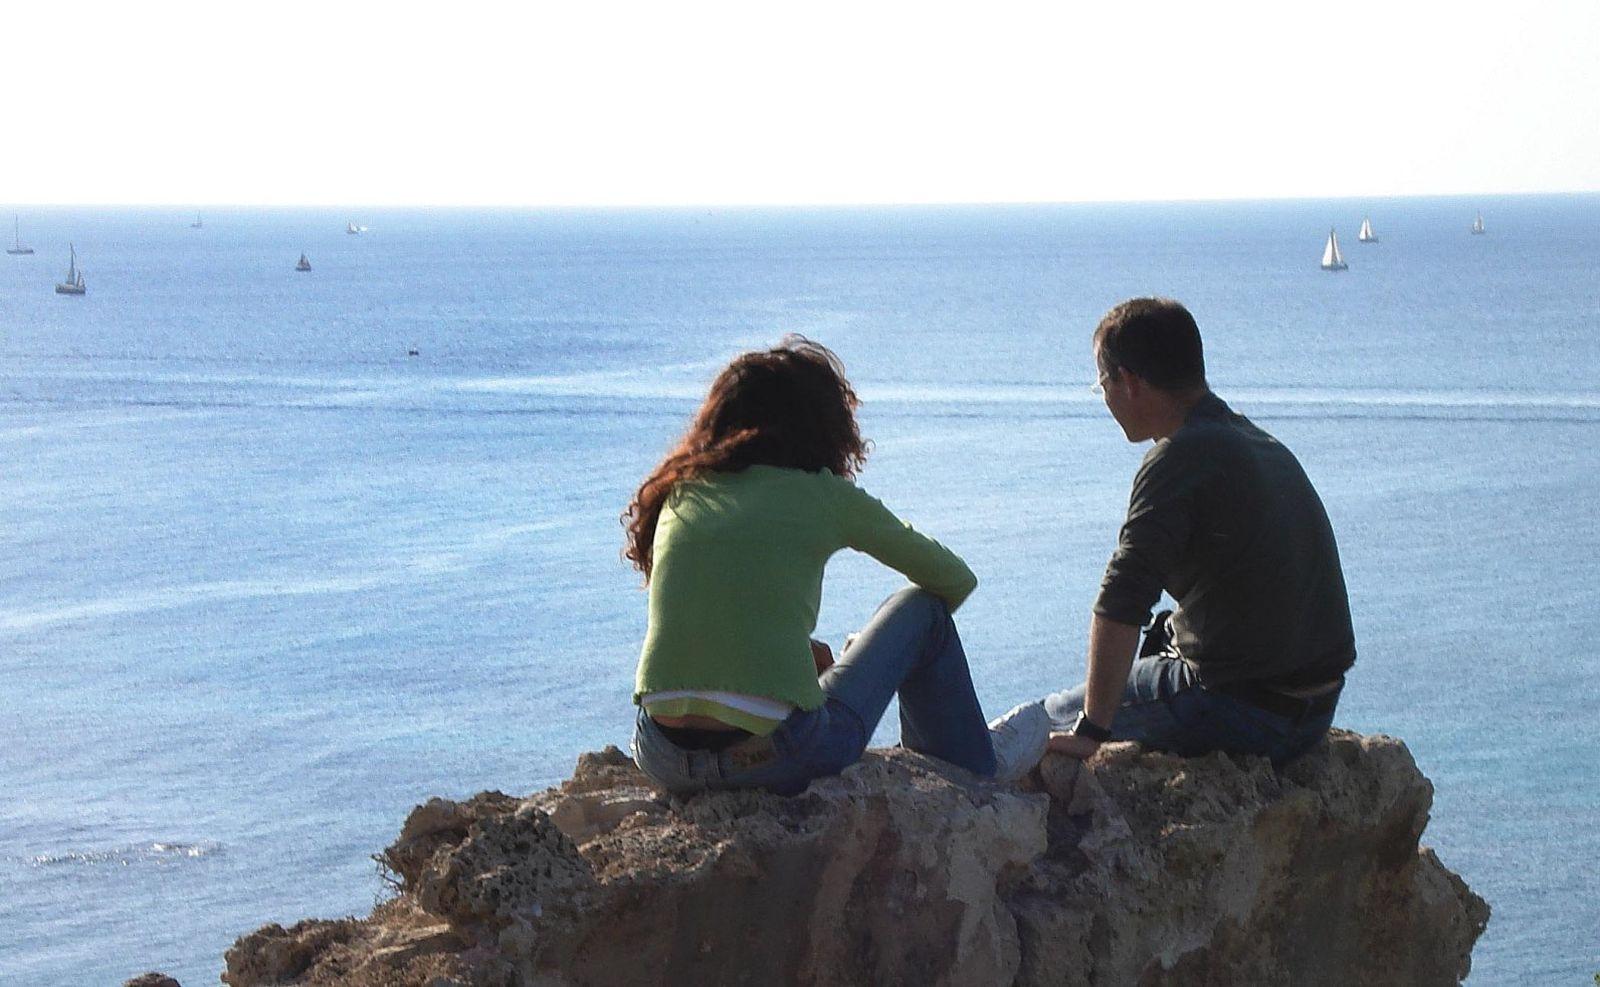 Awesome vistas from Apollonia National Park, Herzliya. Photo by Lara Hart/FLASH90